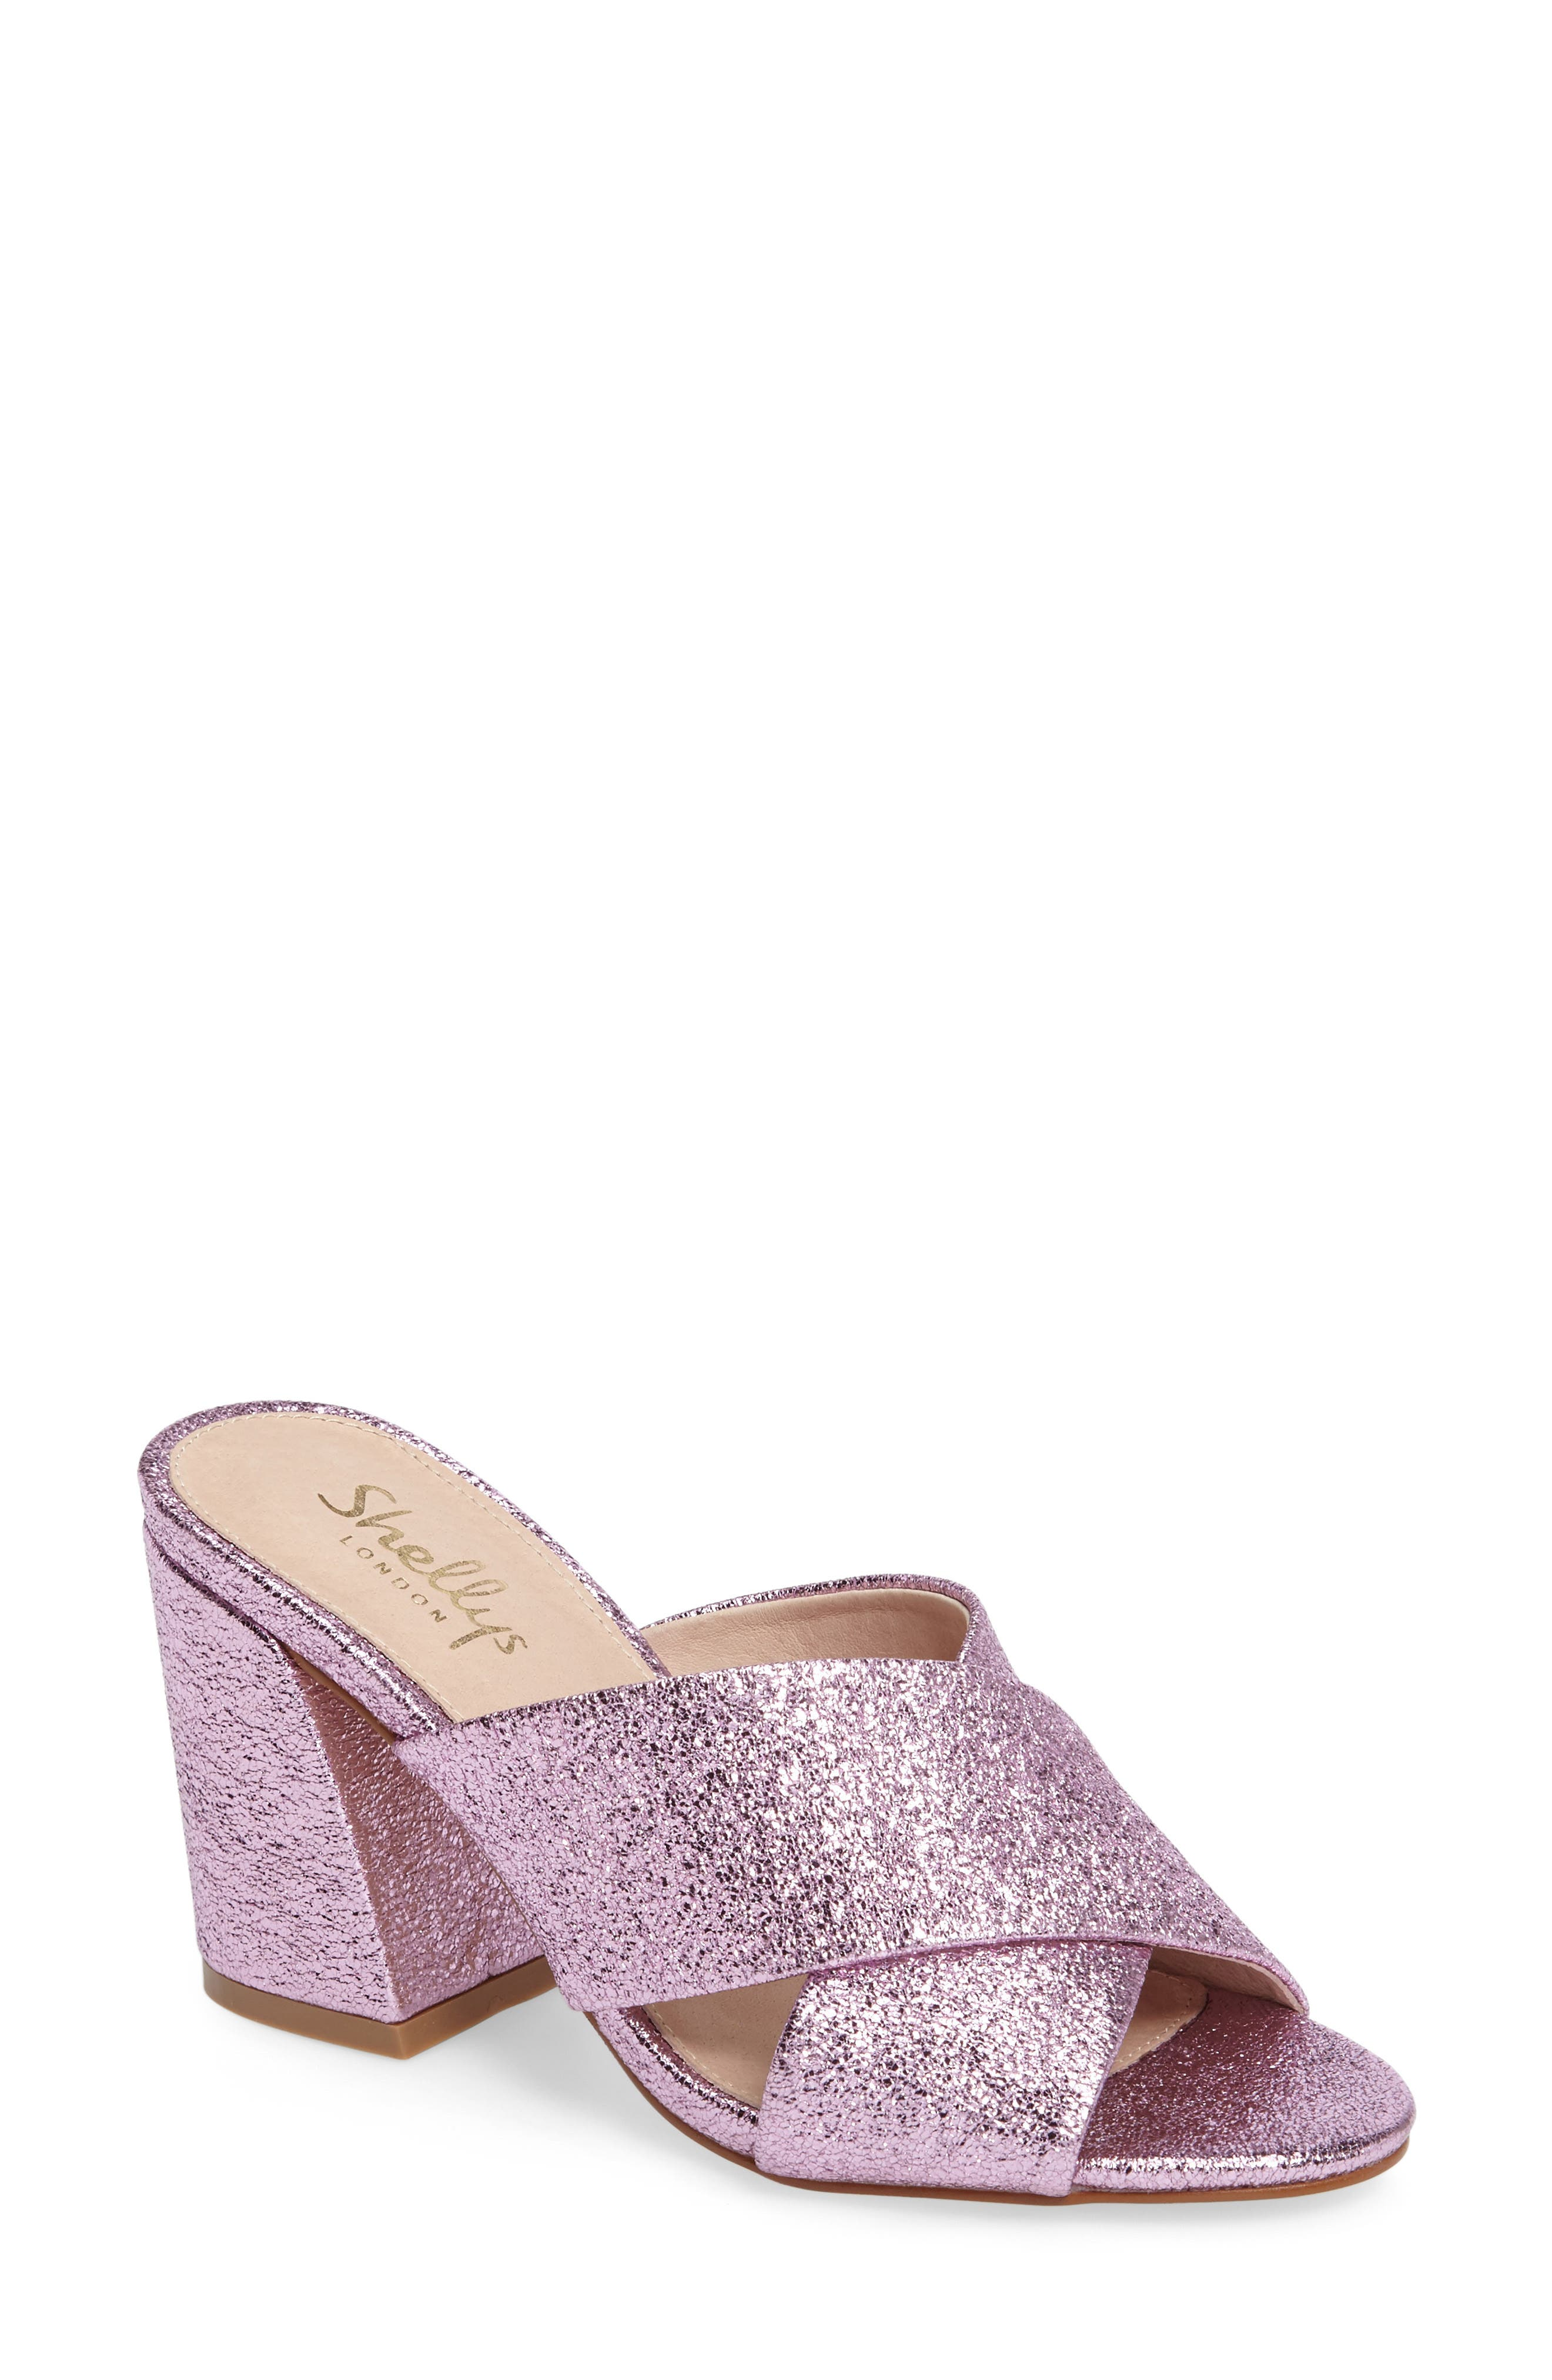 Main Image - Shellys London Dani Block Heel Sandal (Women)